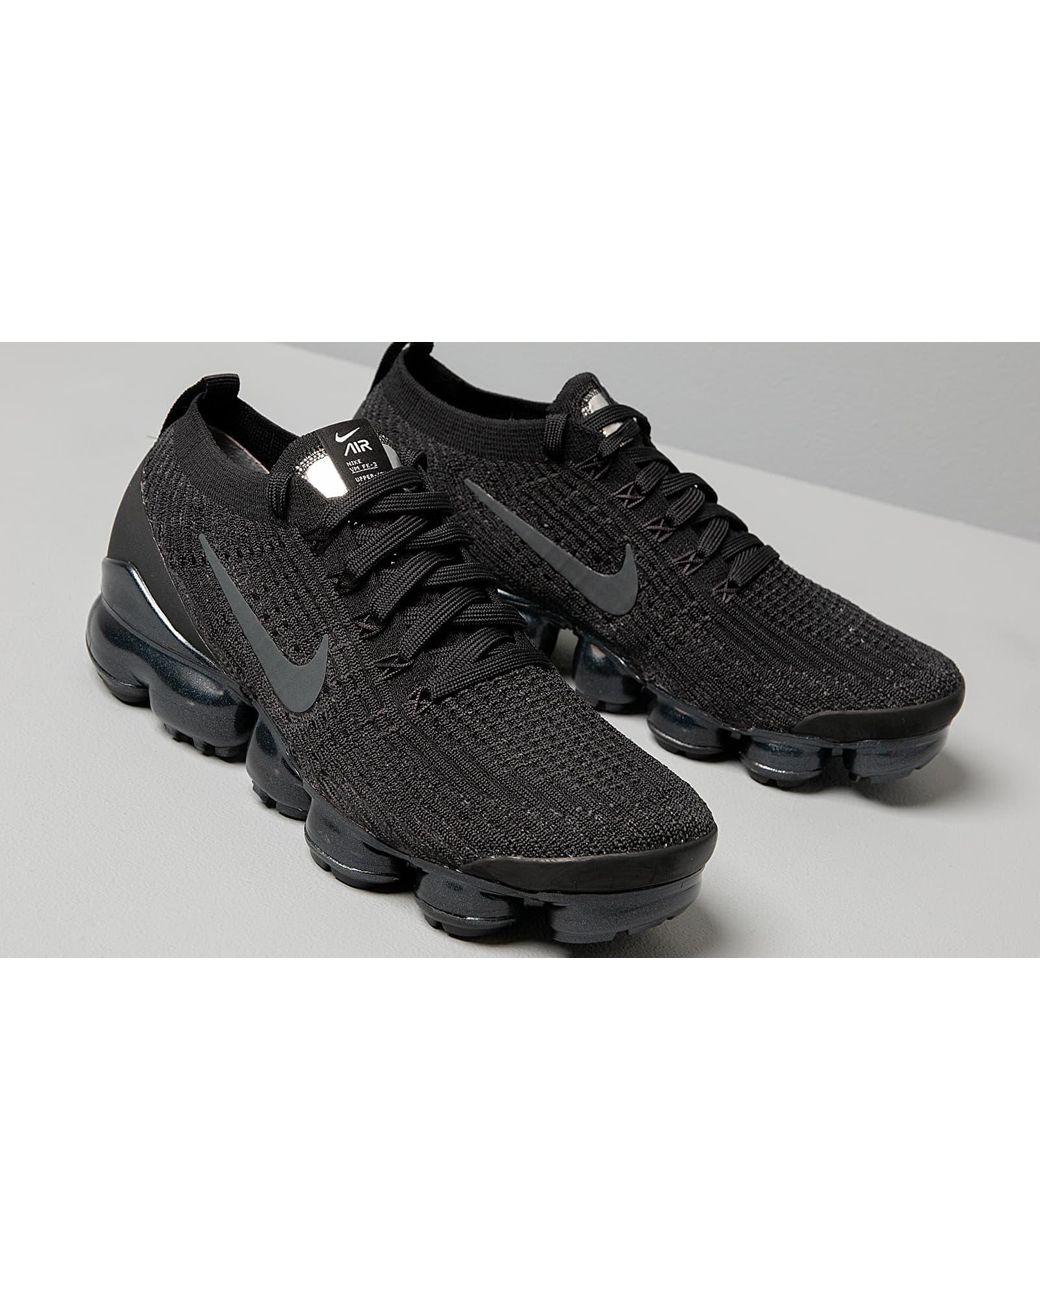 Nike W Air Vapormax Flyknit 3 Black Anthracite white